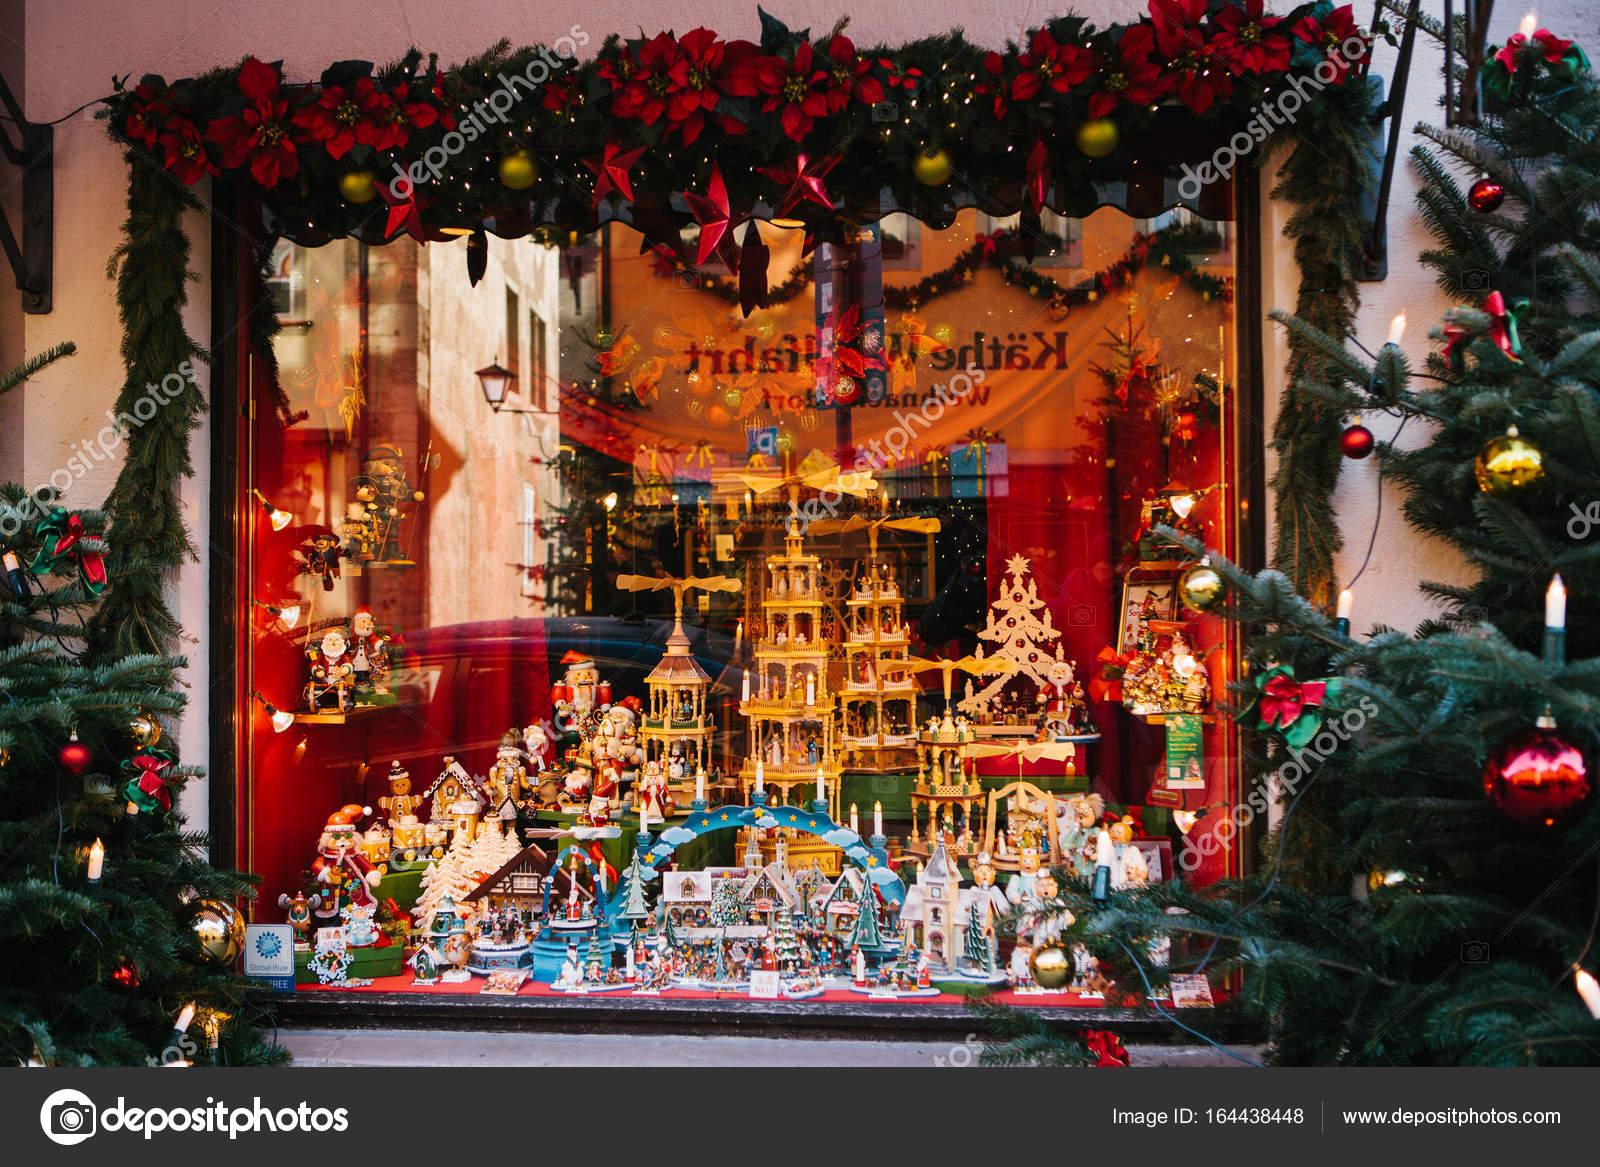 Germany rothenburg ob der tauber december 30 2017 for Salon xmas decorations